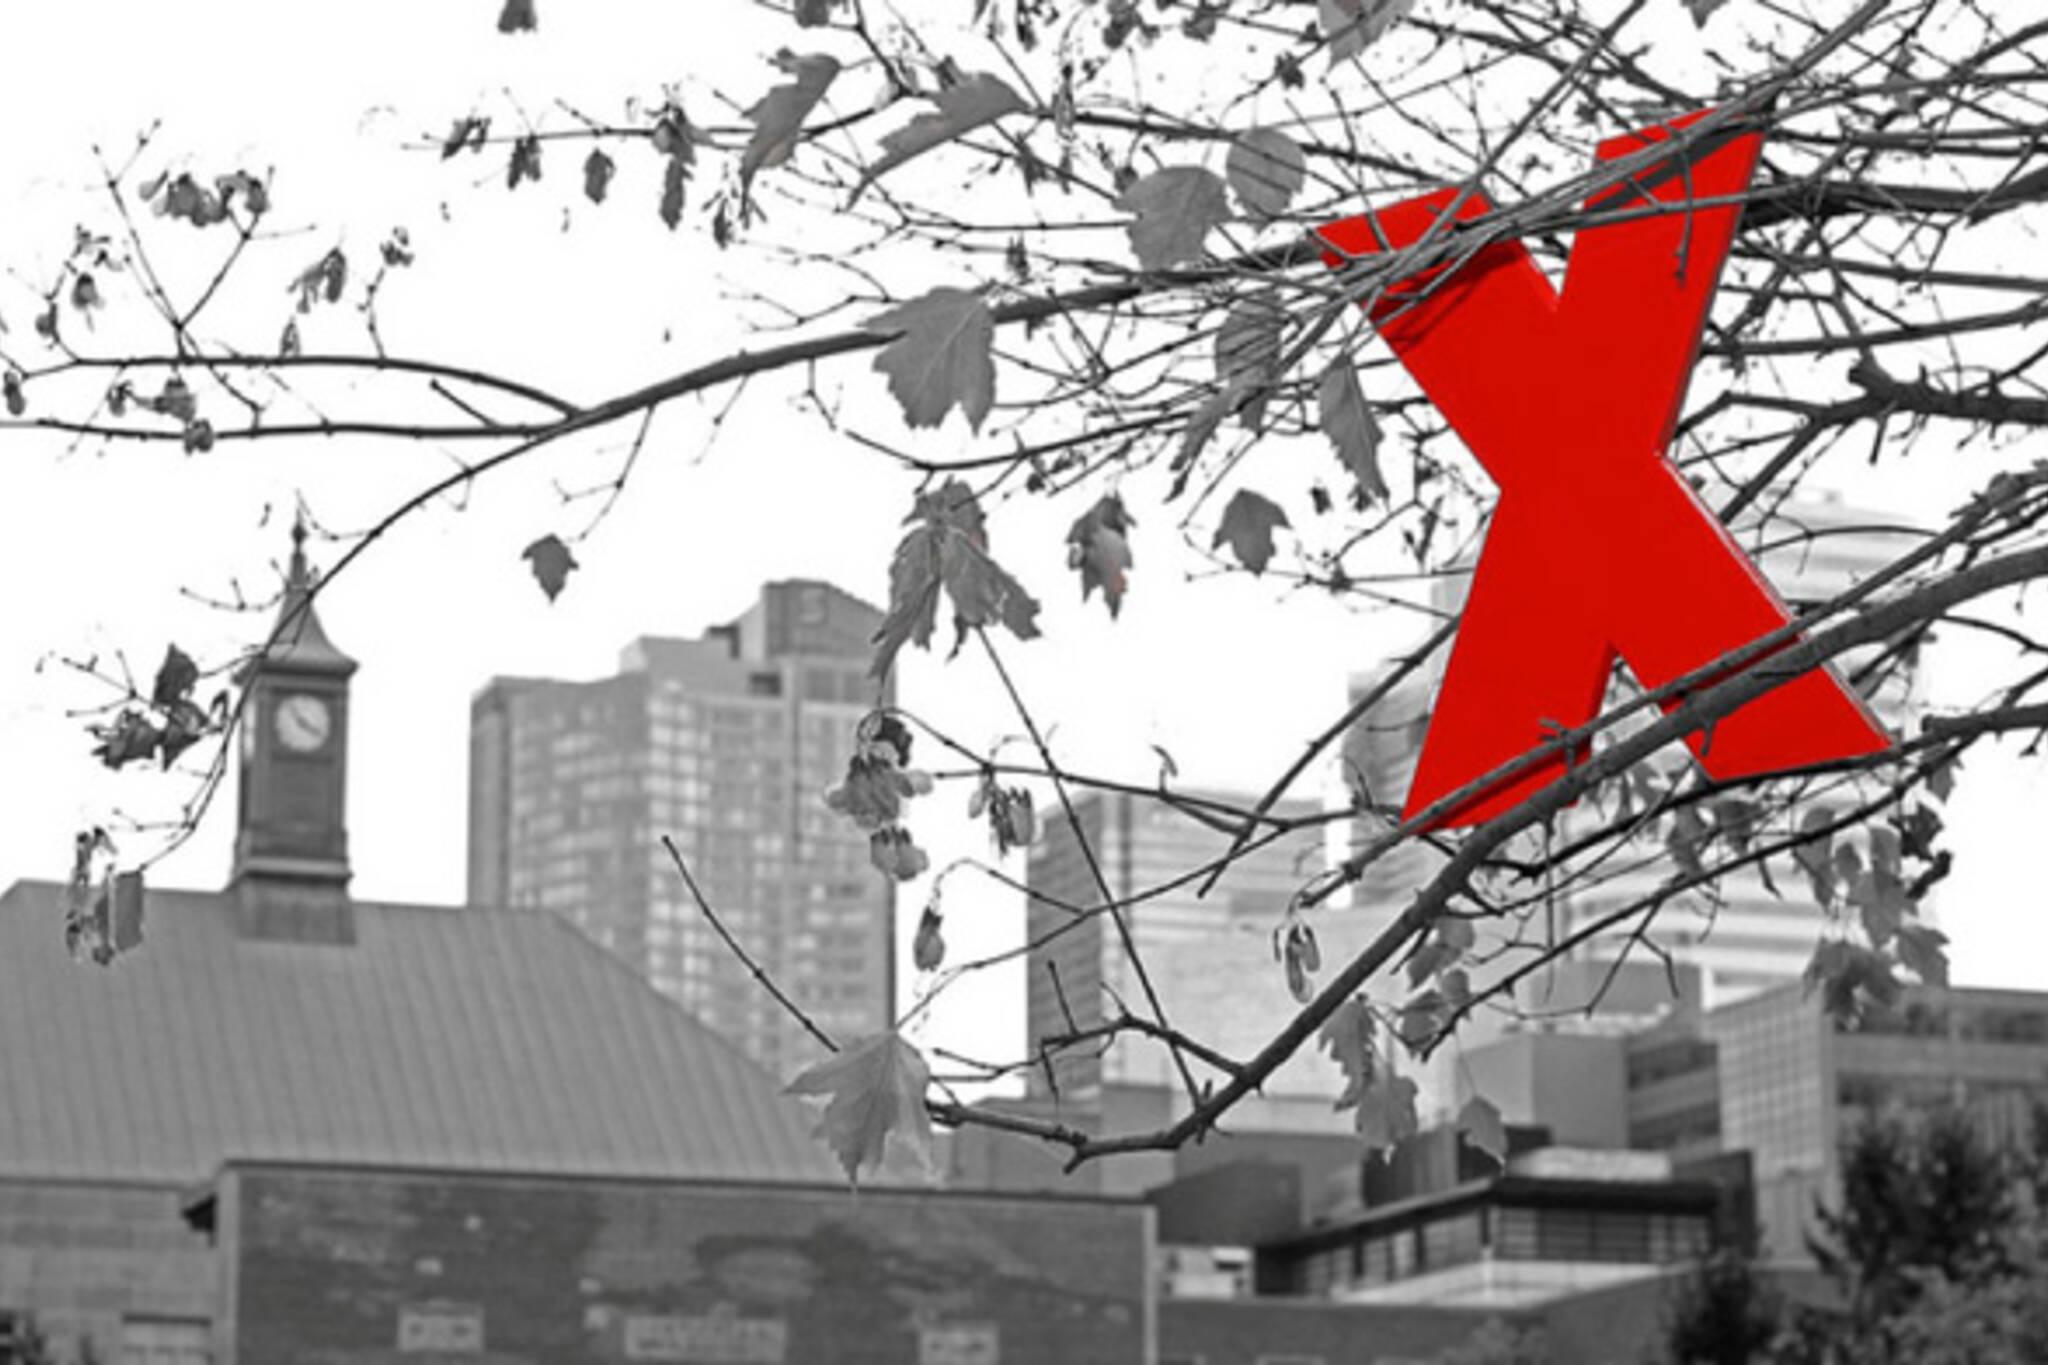 TEDx Ryerson UofT